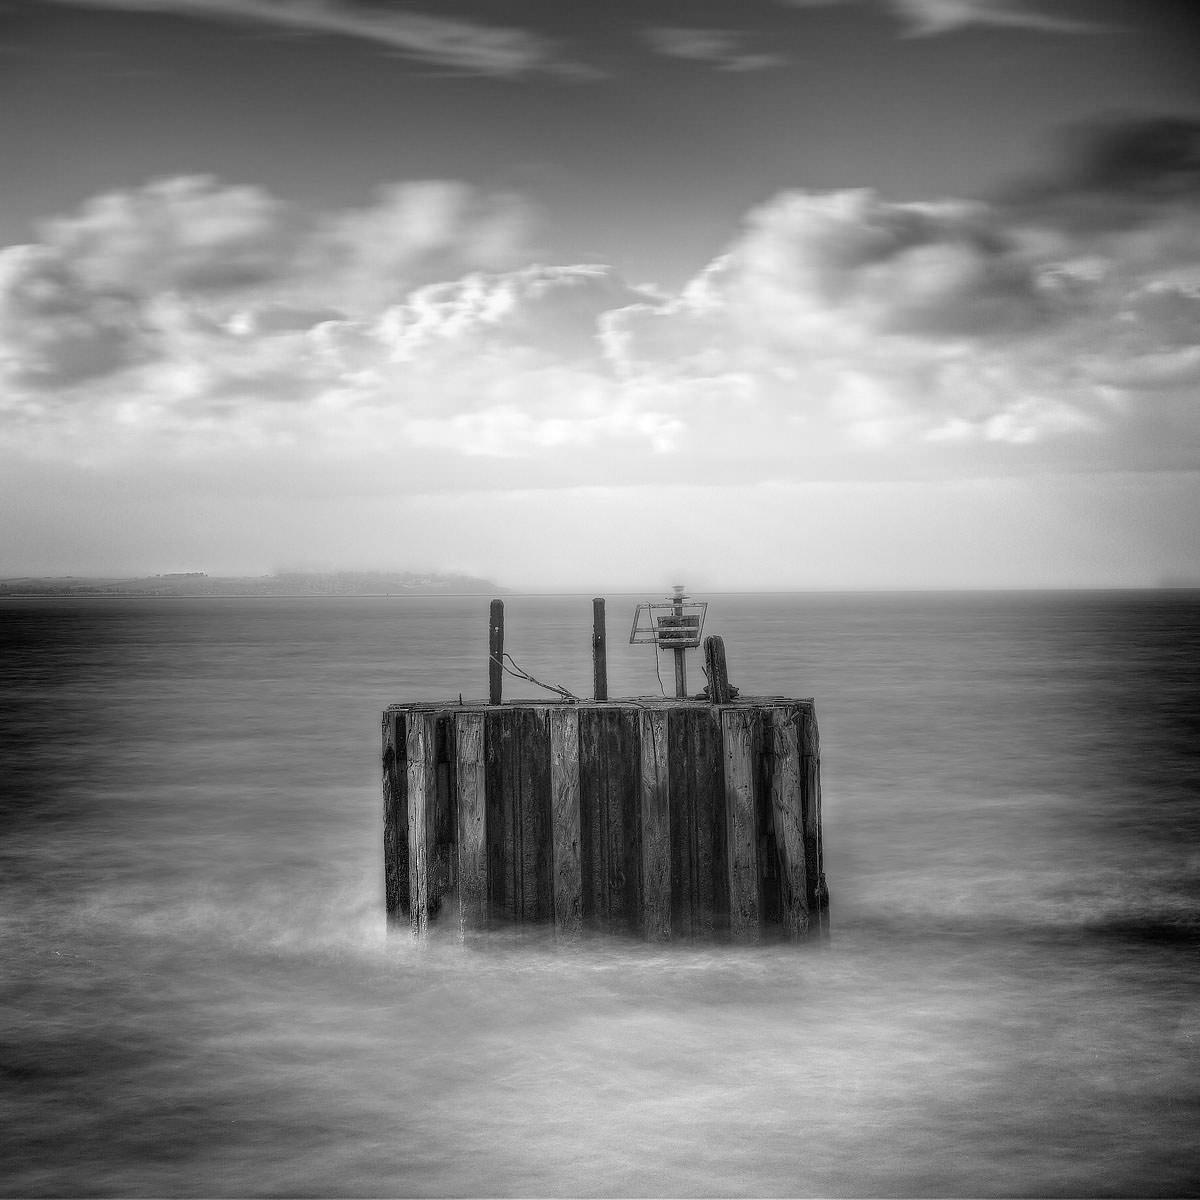 Whitstable Pier